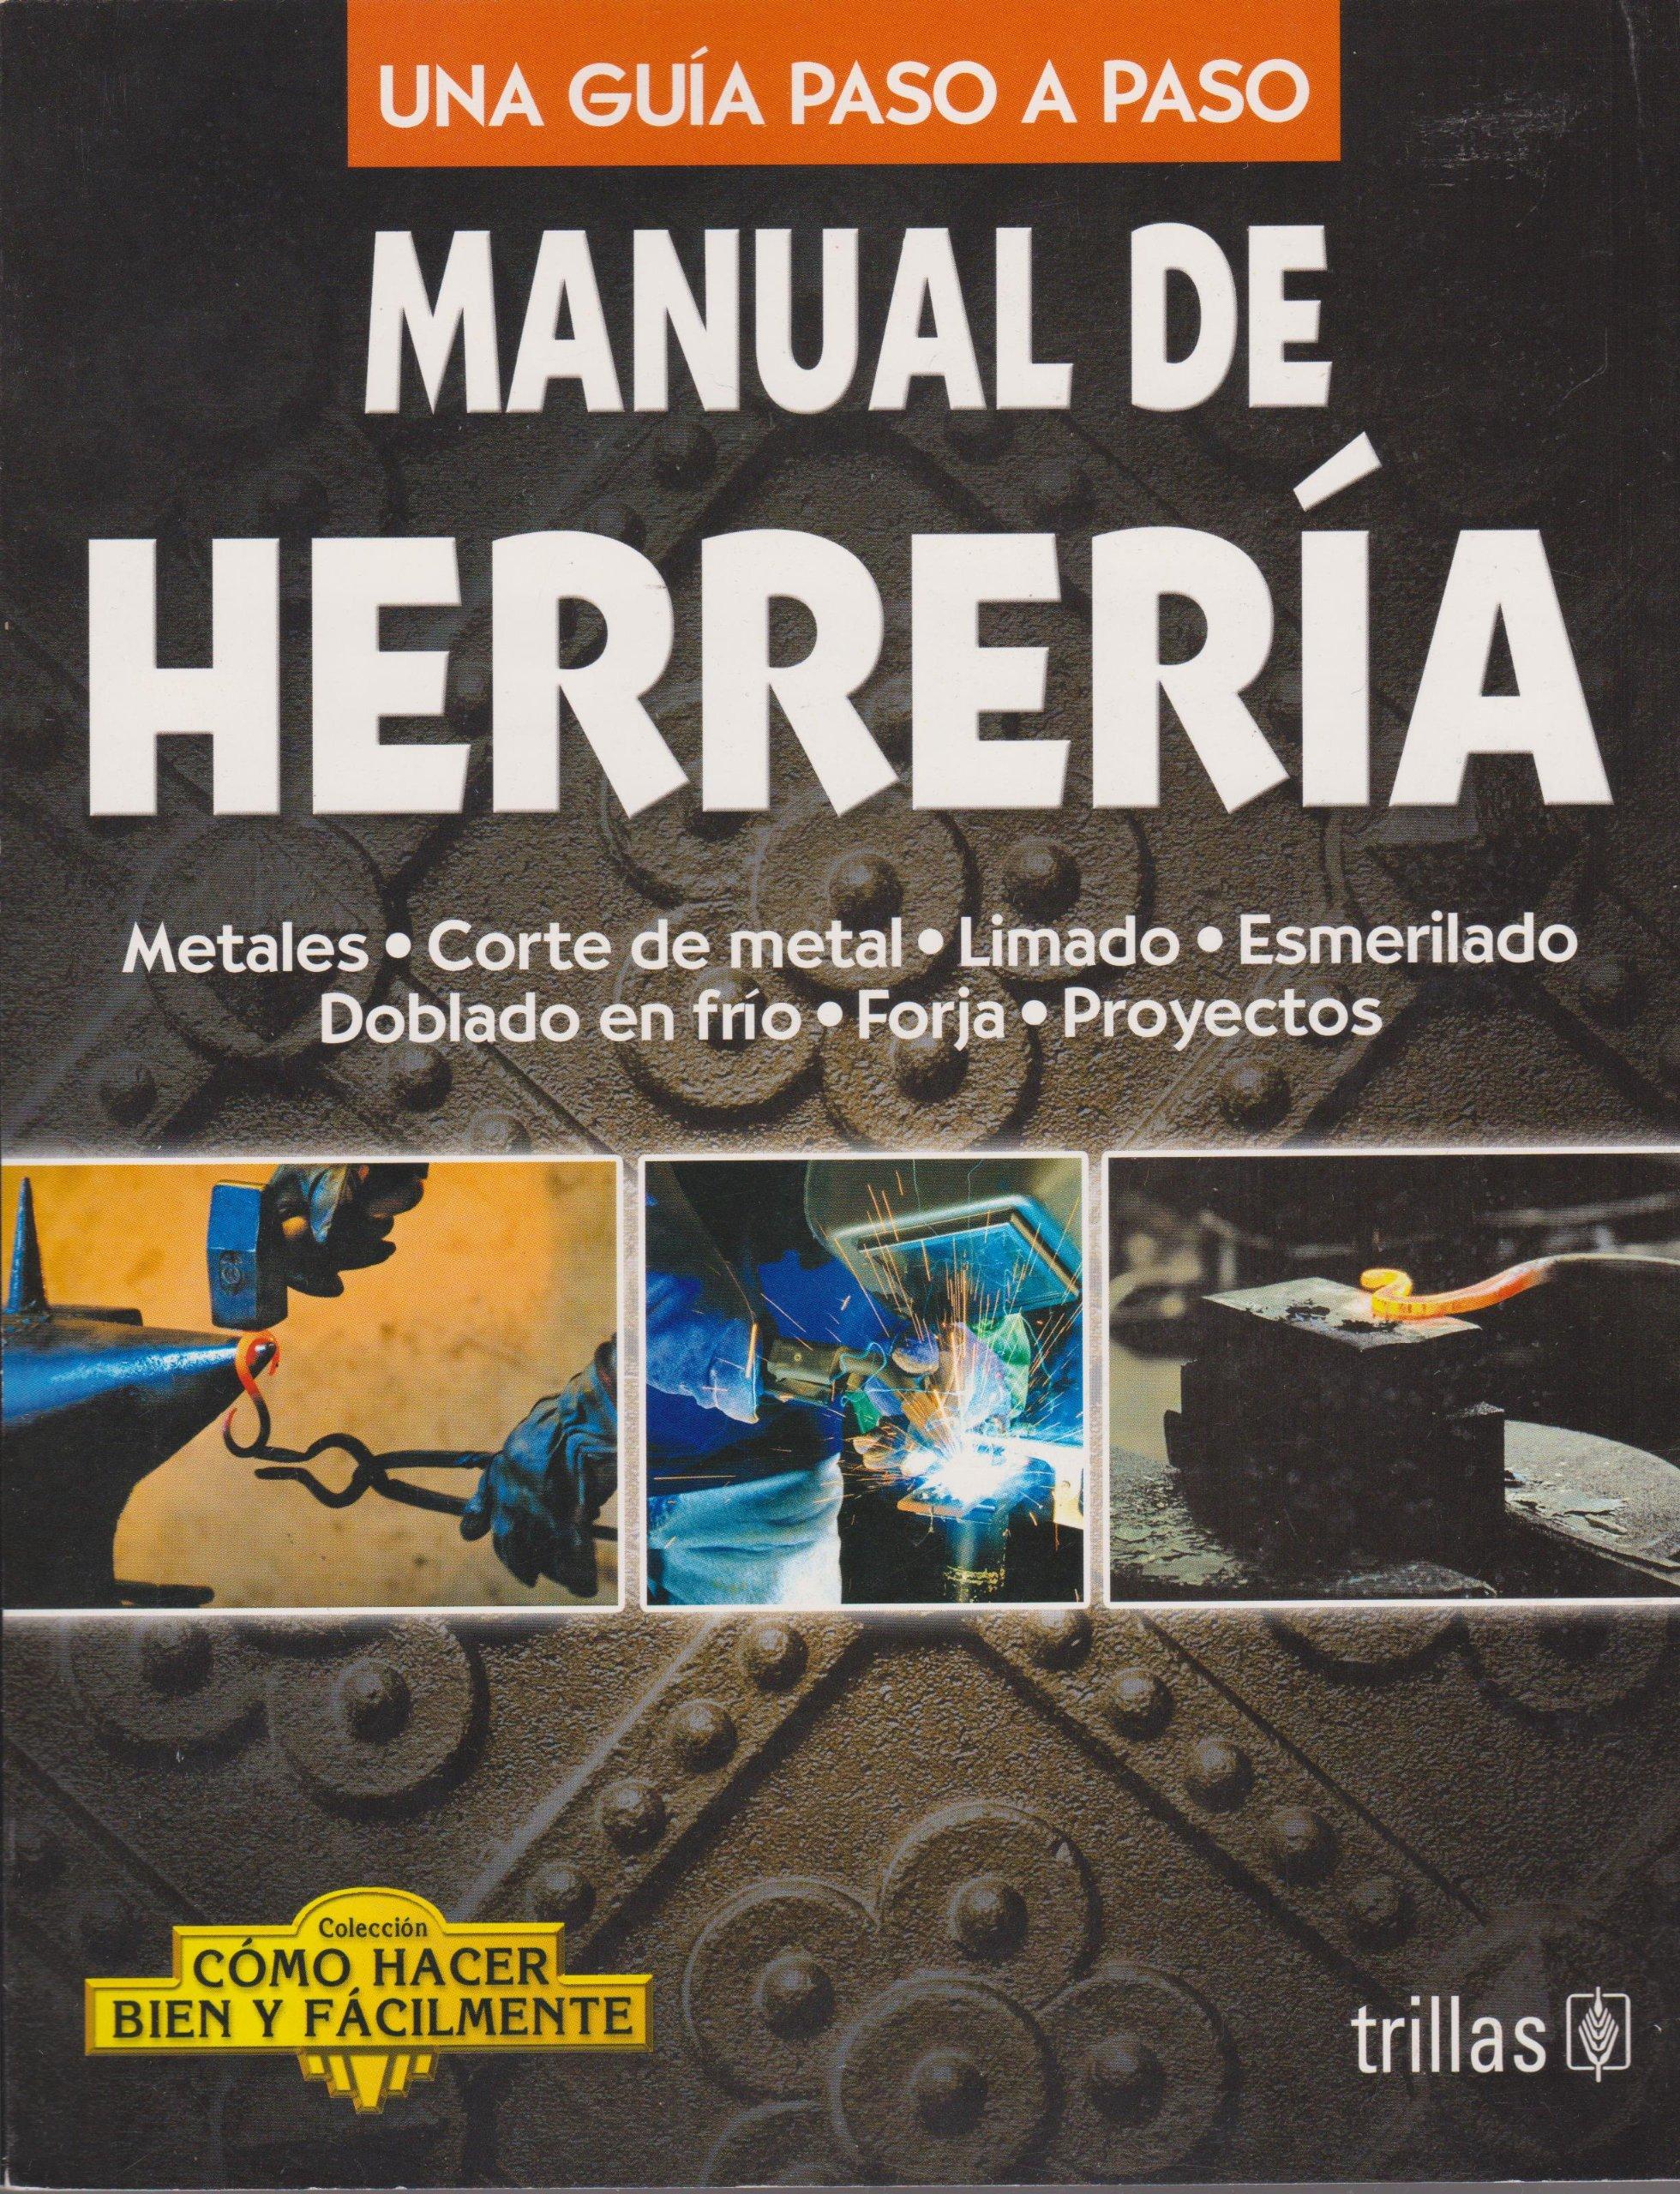 Manual de herreria / Blacksmiths Manual: Una guia paso a paso / A Step by Step Guide (Como hacer bien y facilmente / How to Do it Right and Easy) (Spanish ...